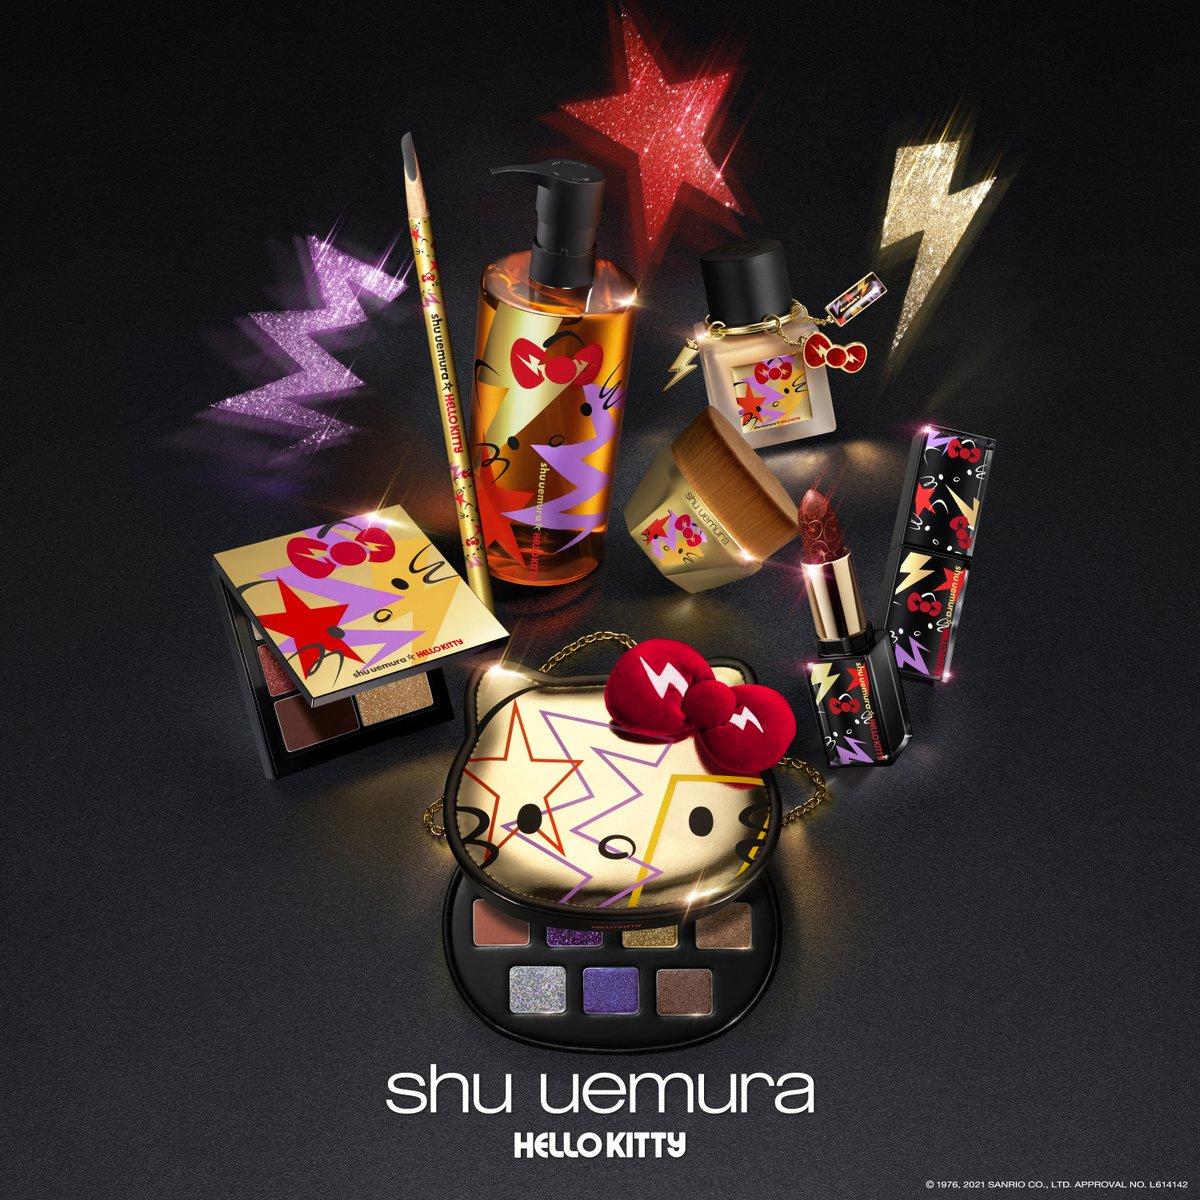 shuuemuraの10月8日のツイッター画像